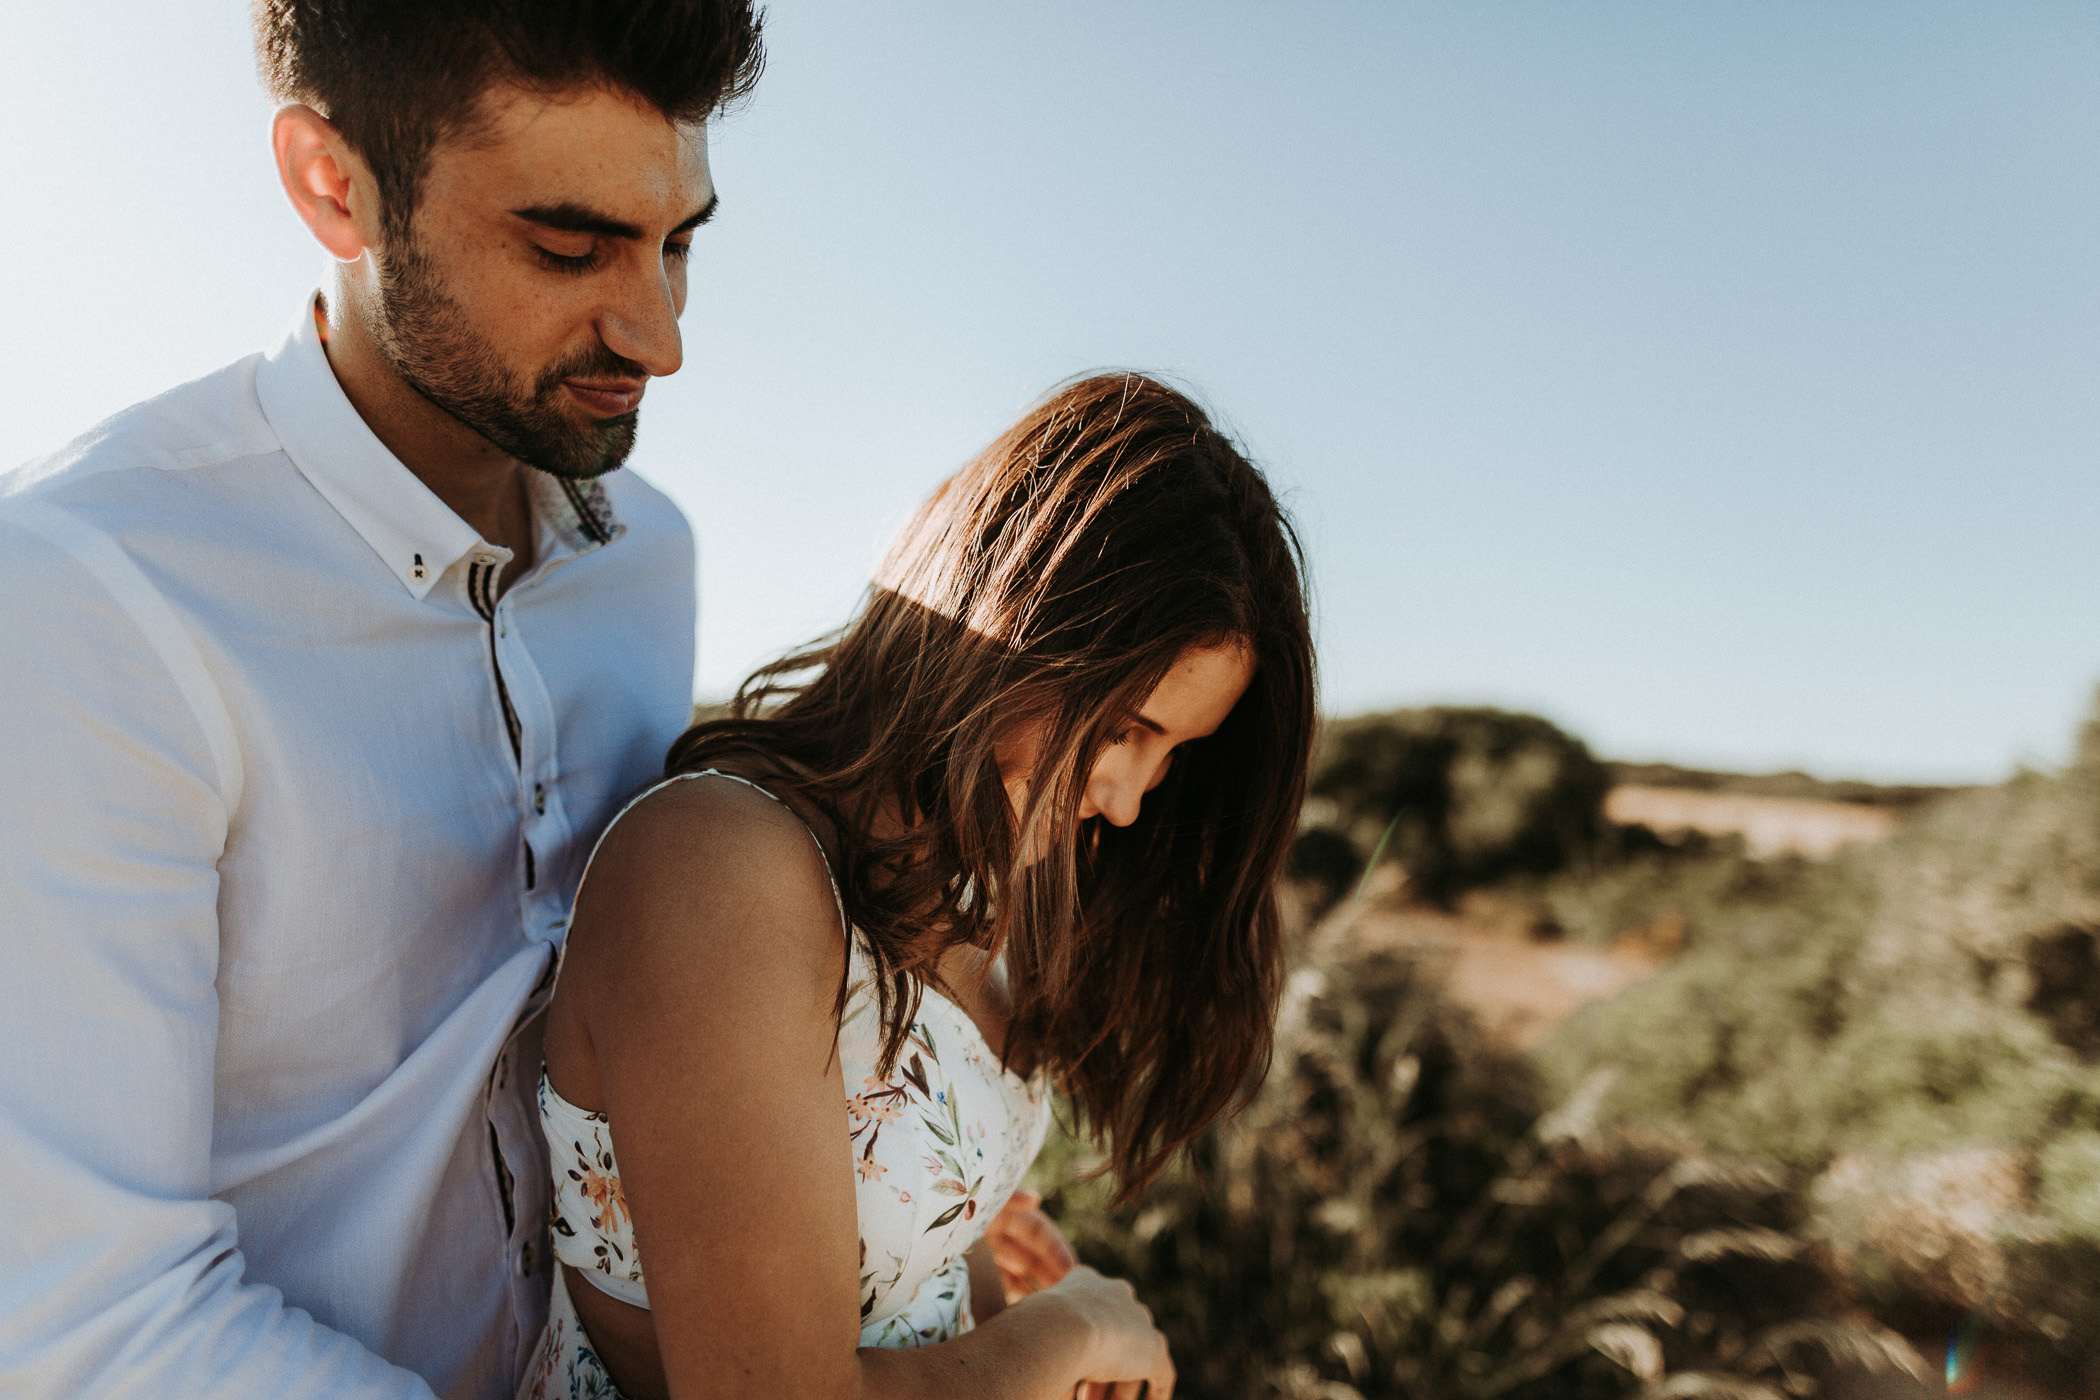 DanielaMarquardtPhotography_wedding_elopement_mallorca_spain_calapi_palma_lauraandtoni_229